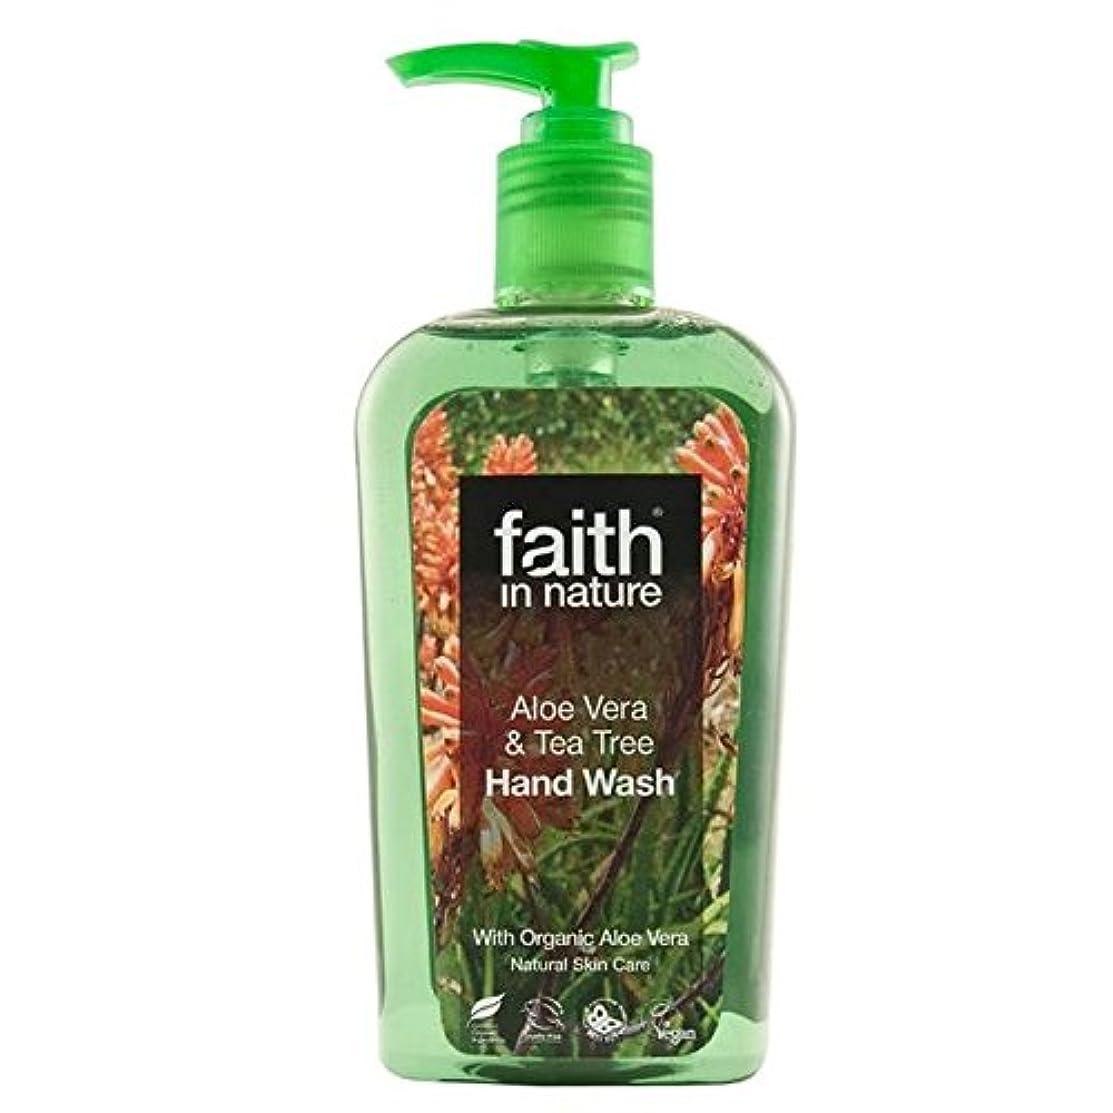 Faith in Nature Aloe Vera & Tea Tree Handwash 300ml (Pack of 4) - (Faith In Nature) 自然のアロエベラ&ティーツリー手洗いの300ミリリットルの信仰 (x4) [並行輸入品]